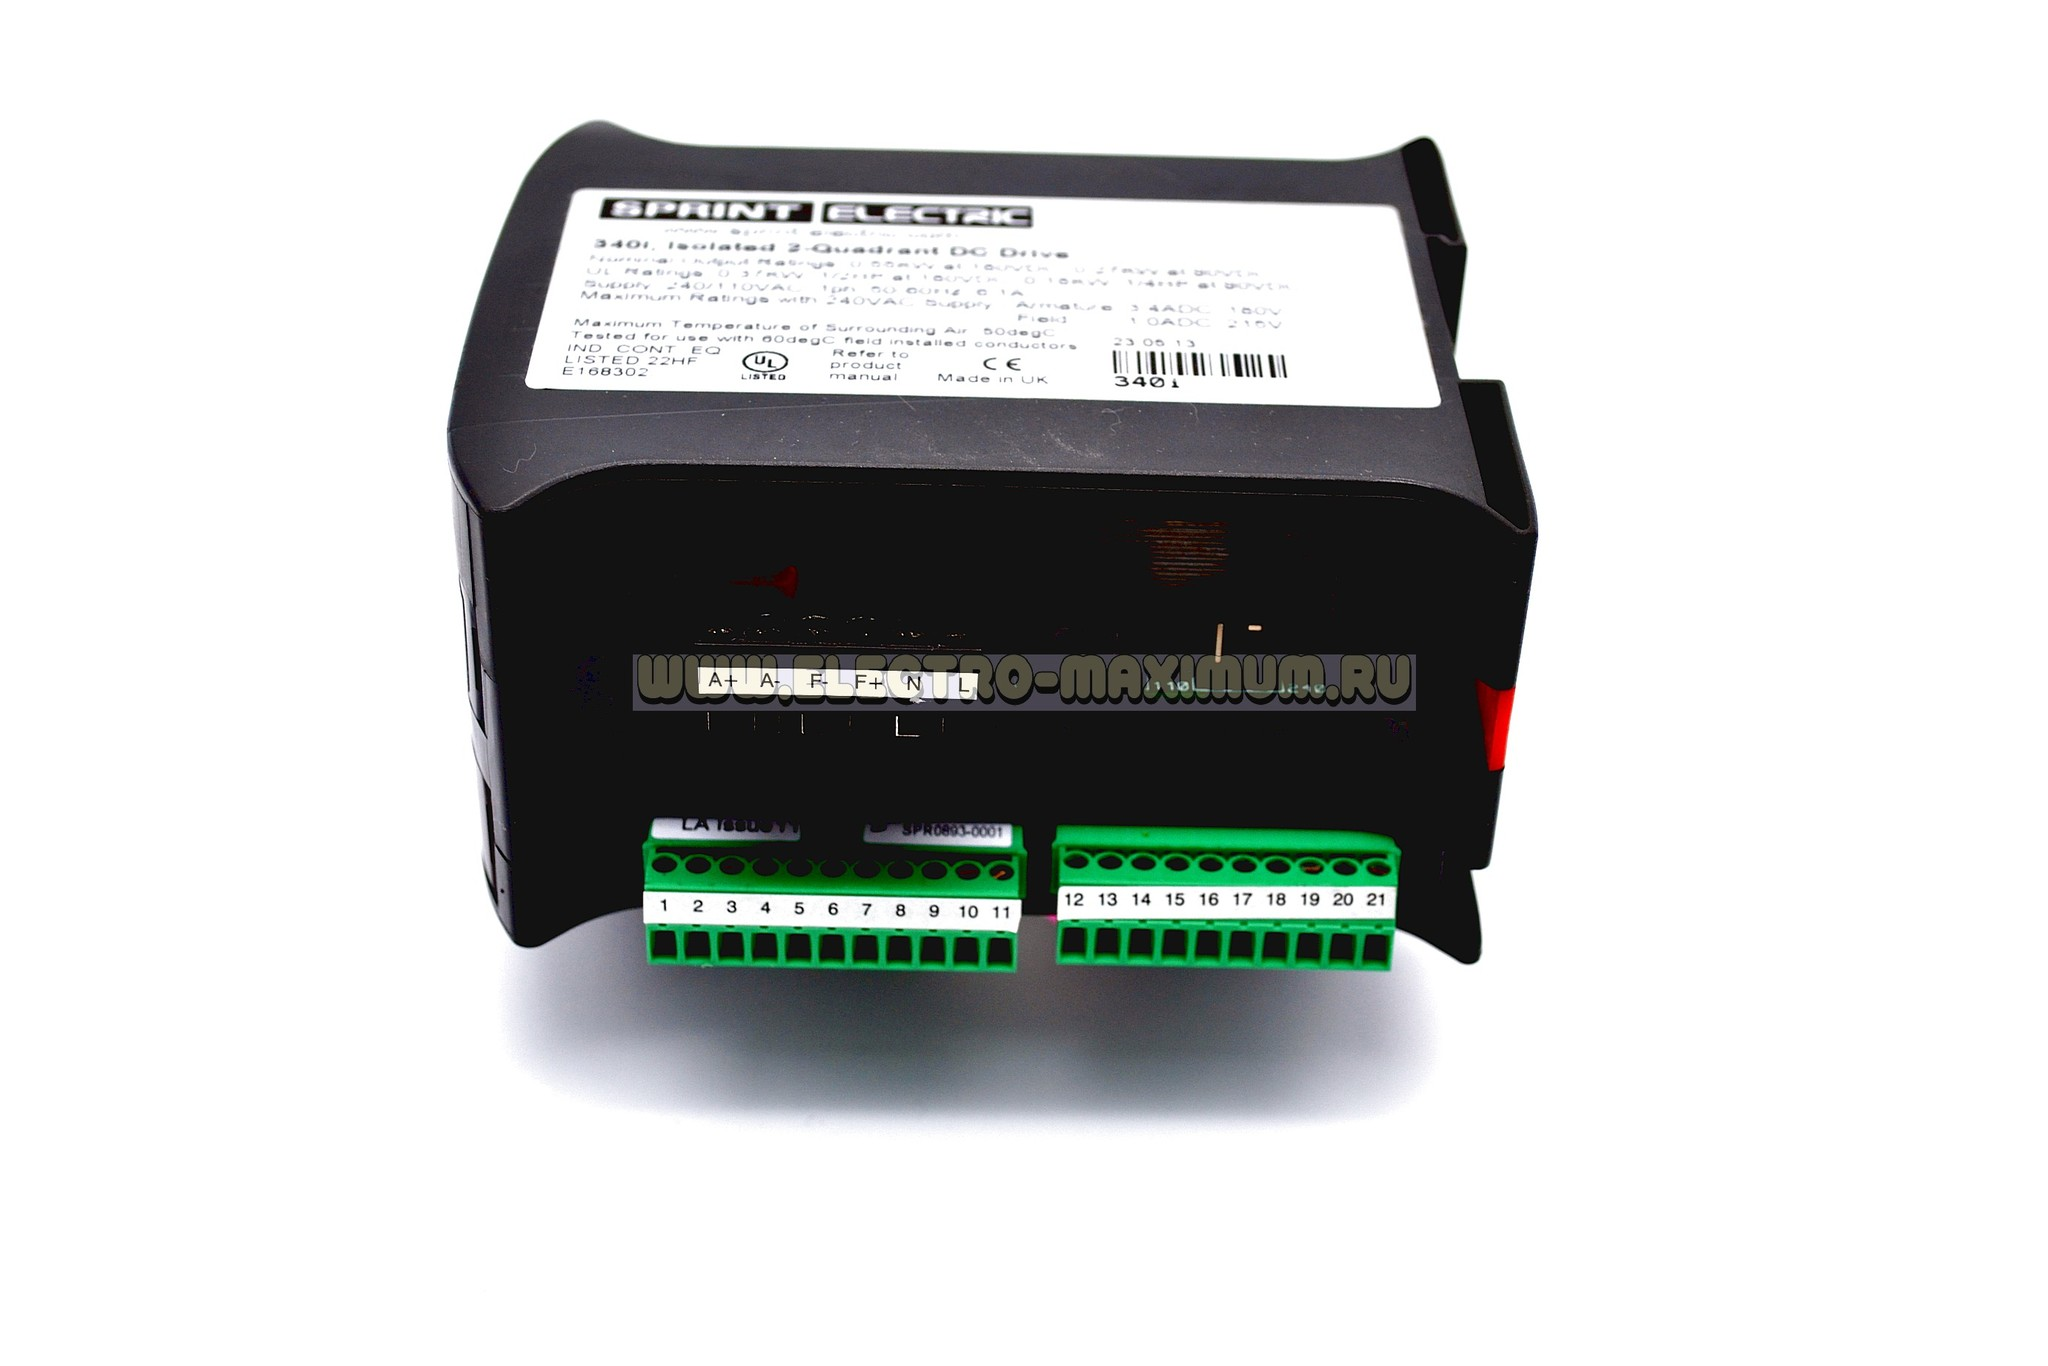 SPRINT ELECTRIC 340I